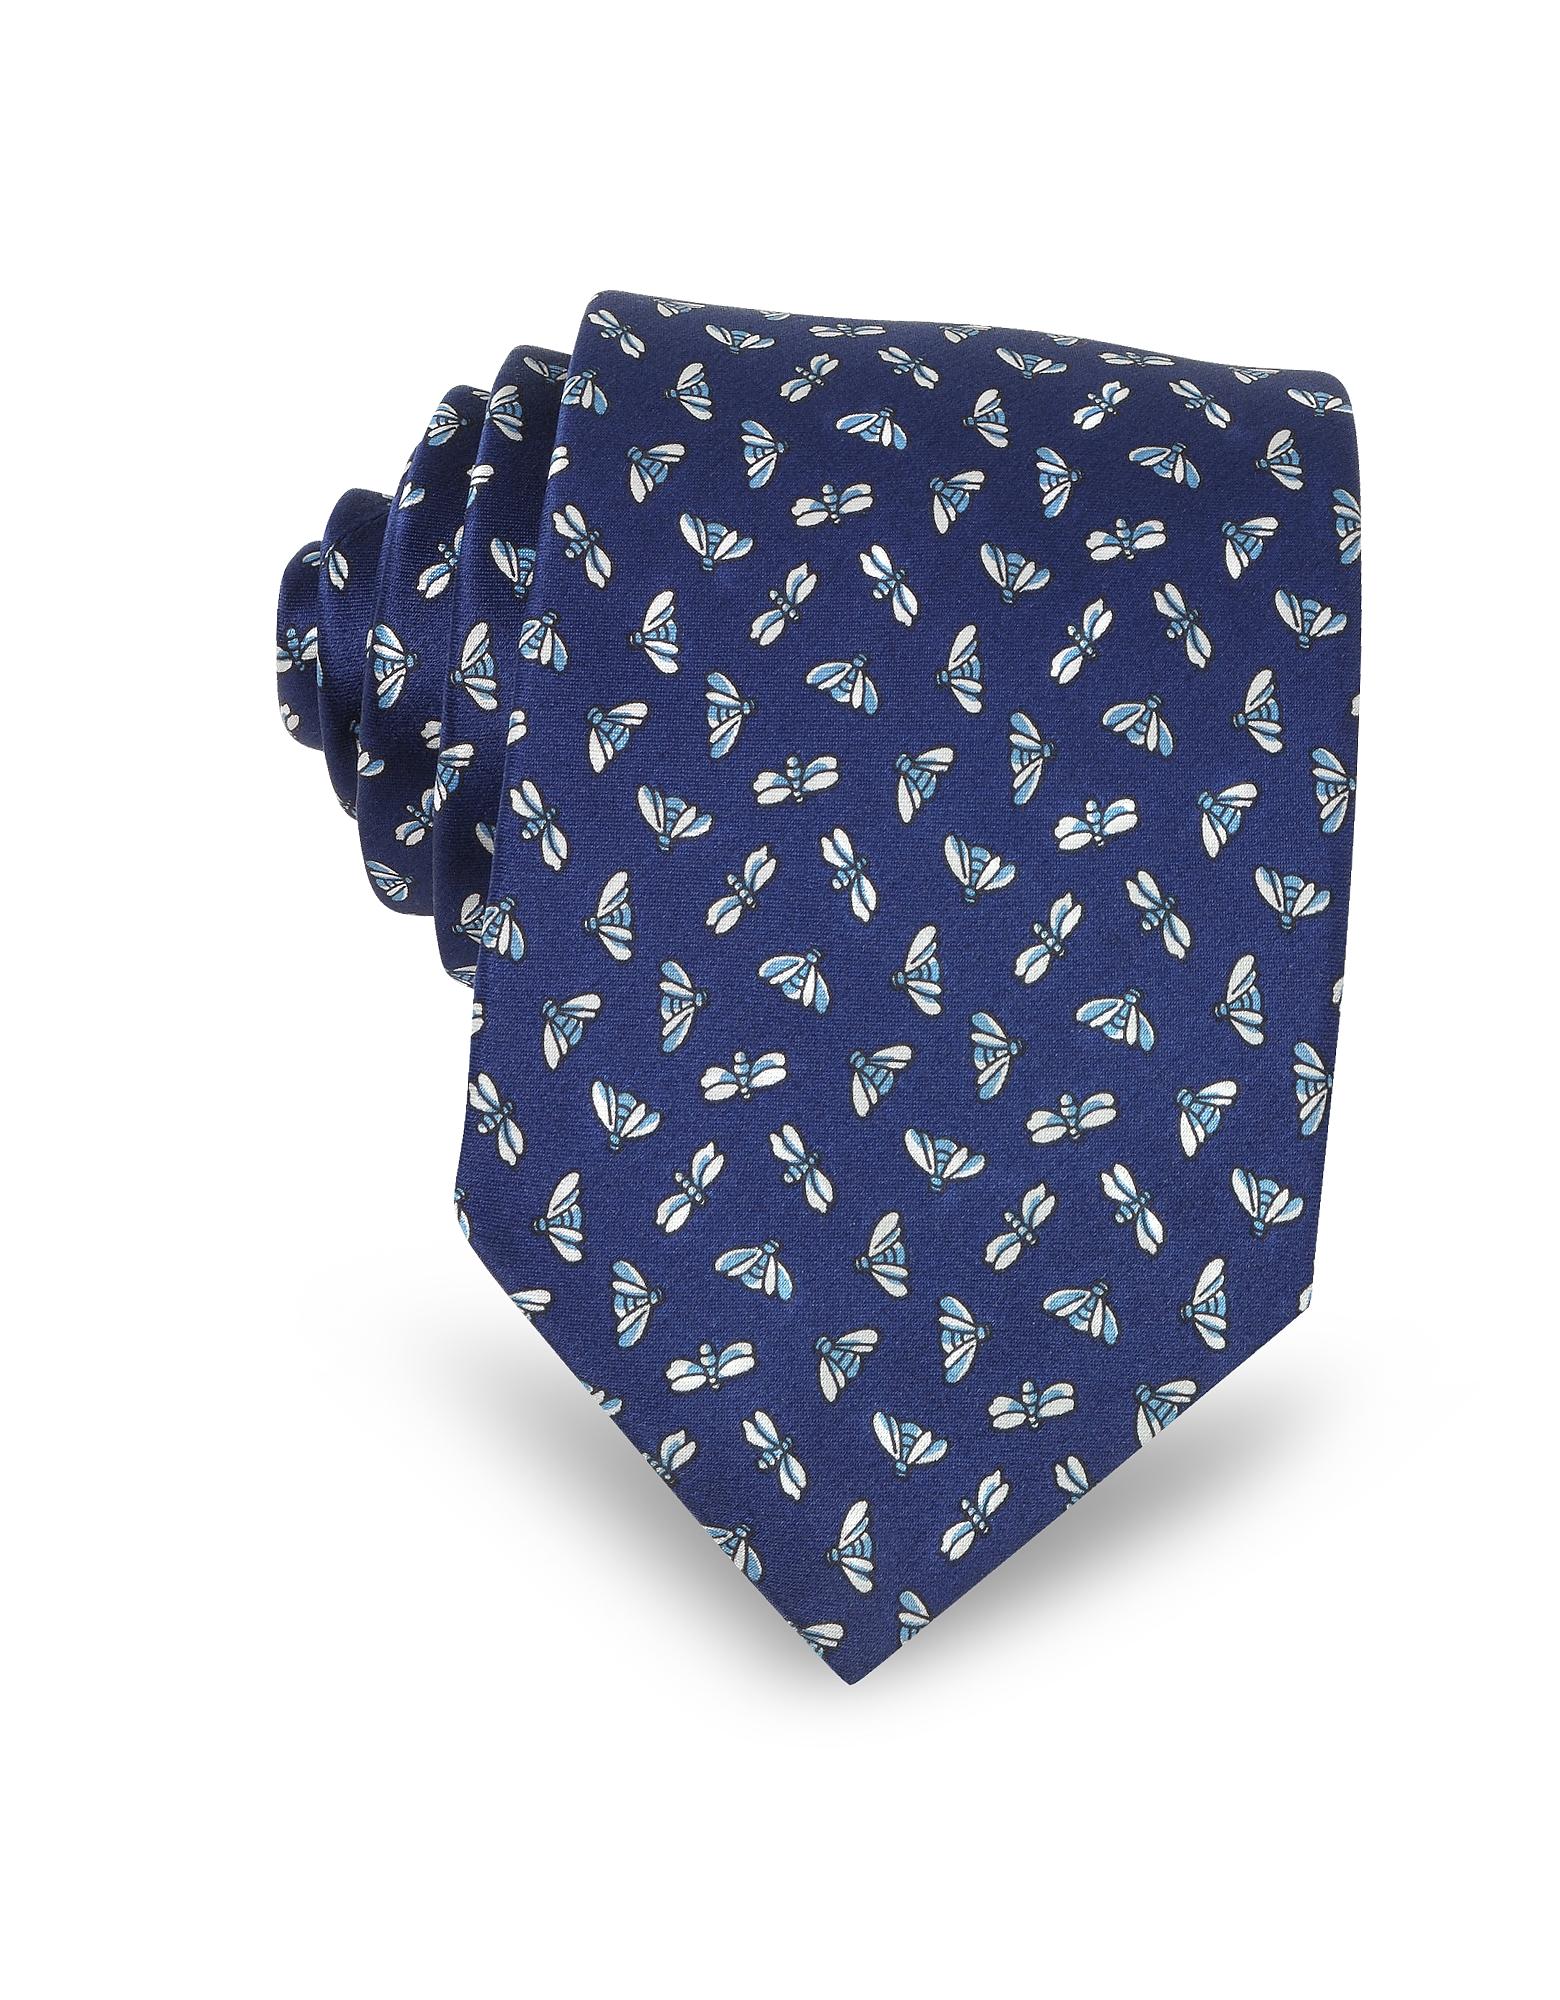 Lanvin Ties, Fly Print Silk Men's Narrow Tie